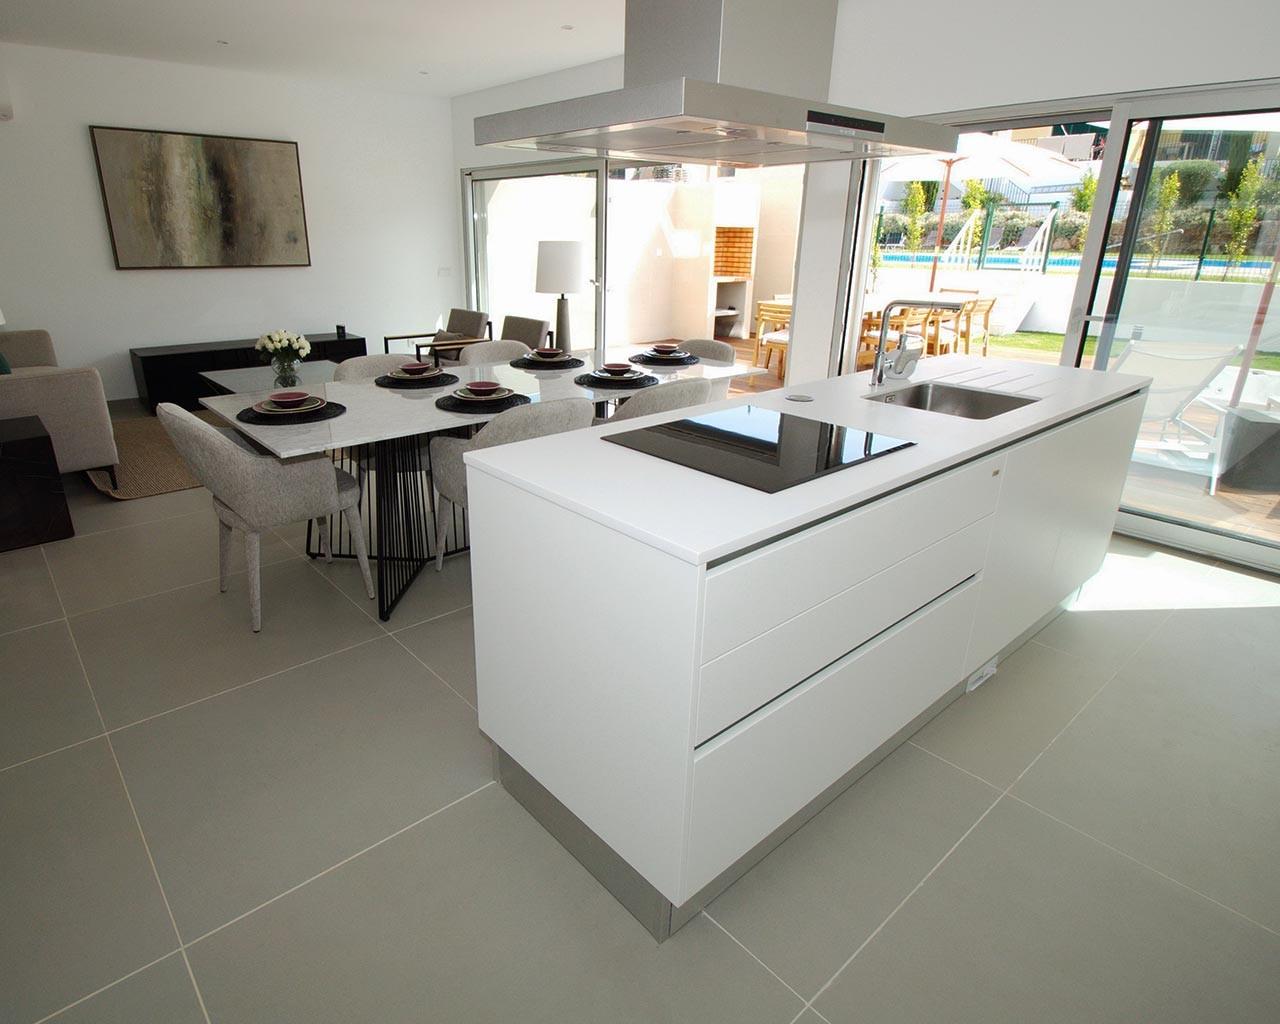 ferragudo-design-villas-cozinha+sala de jantar